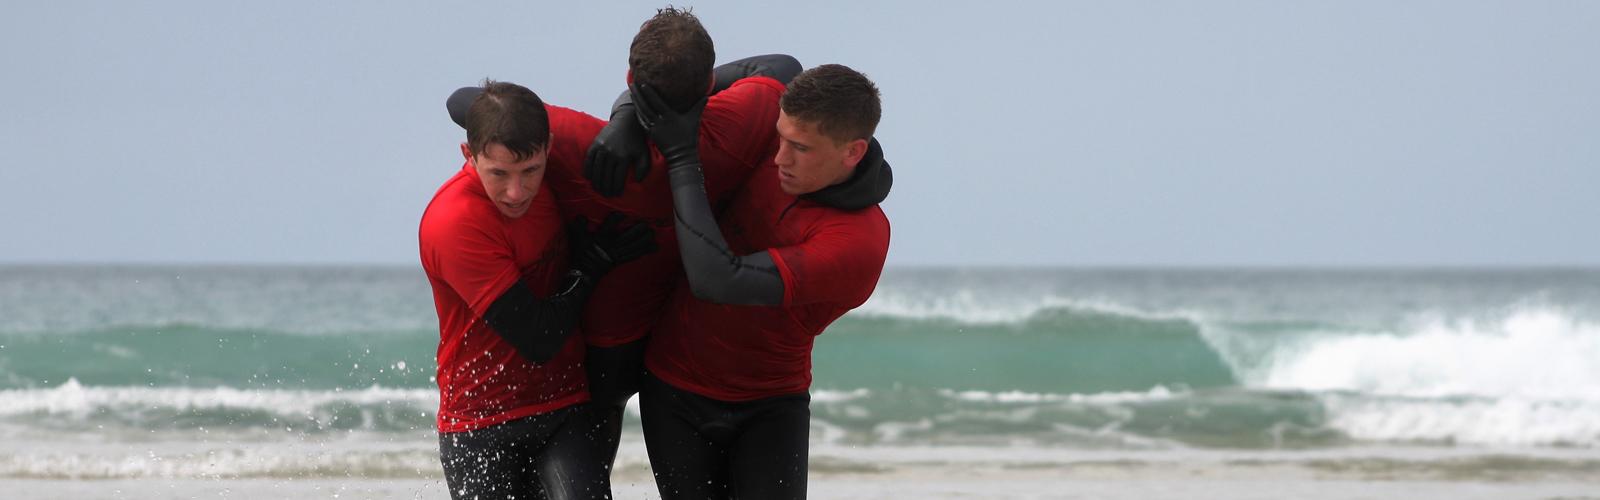 1690e52037b Beach Lifeguard Training Courses in Cornwall